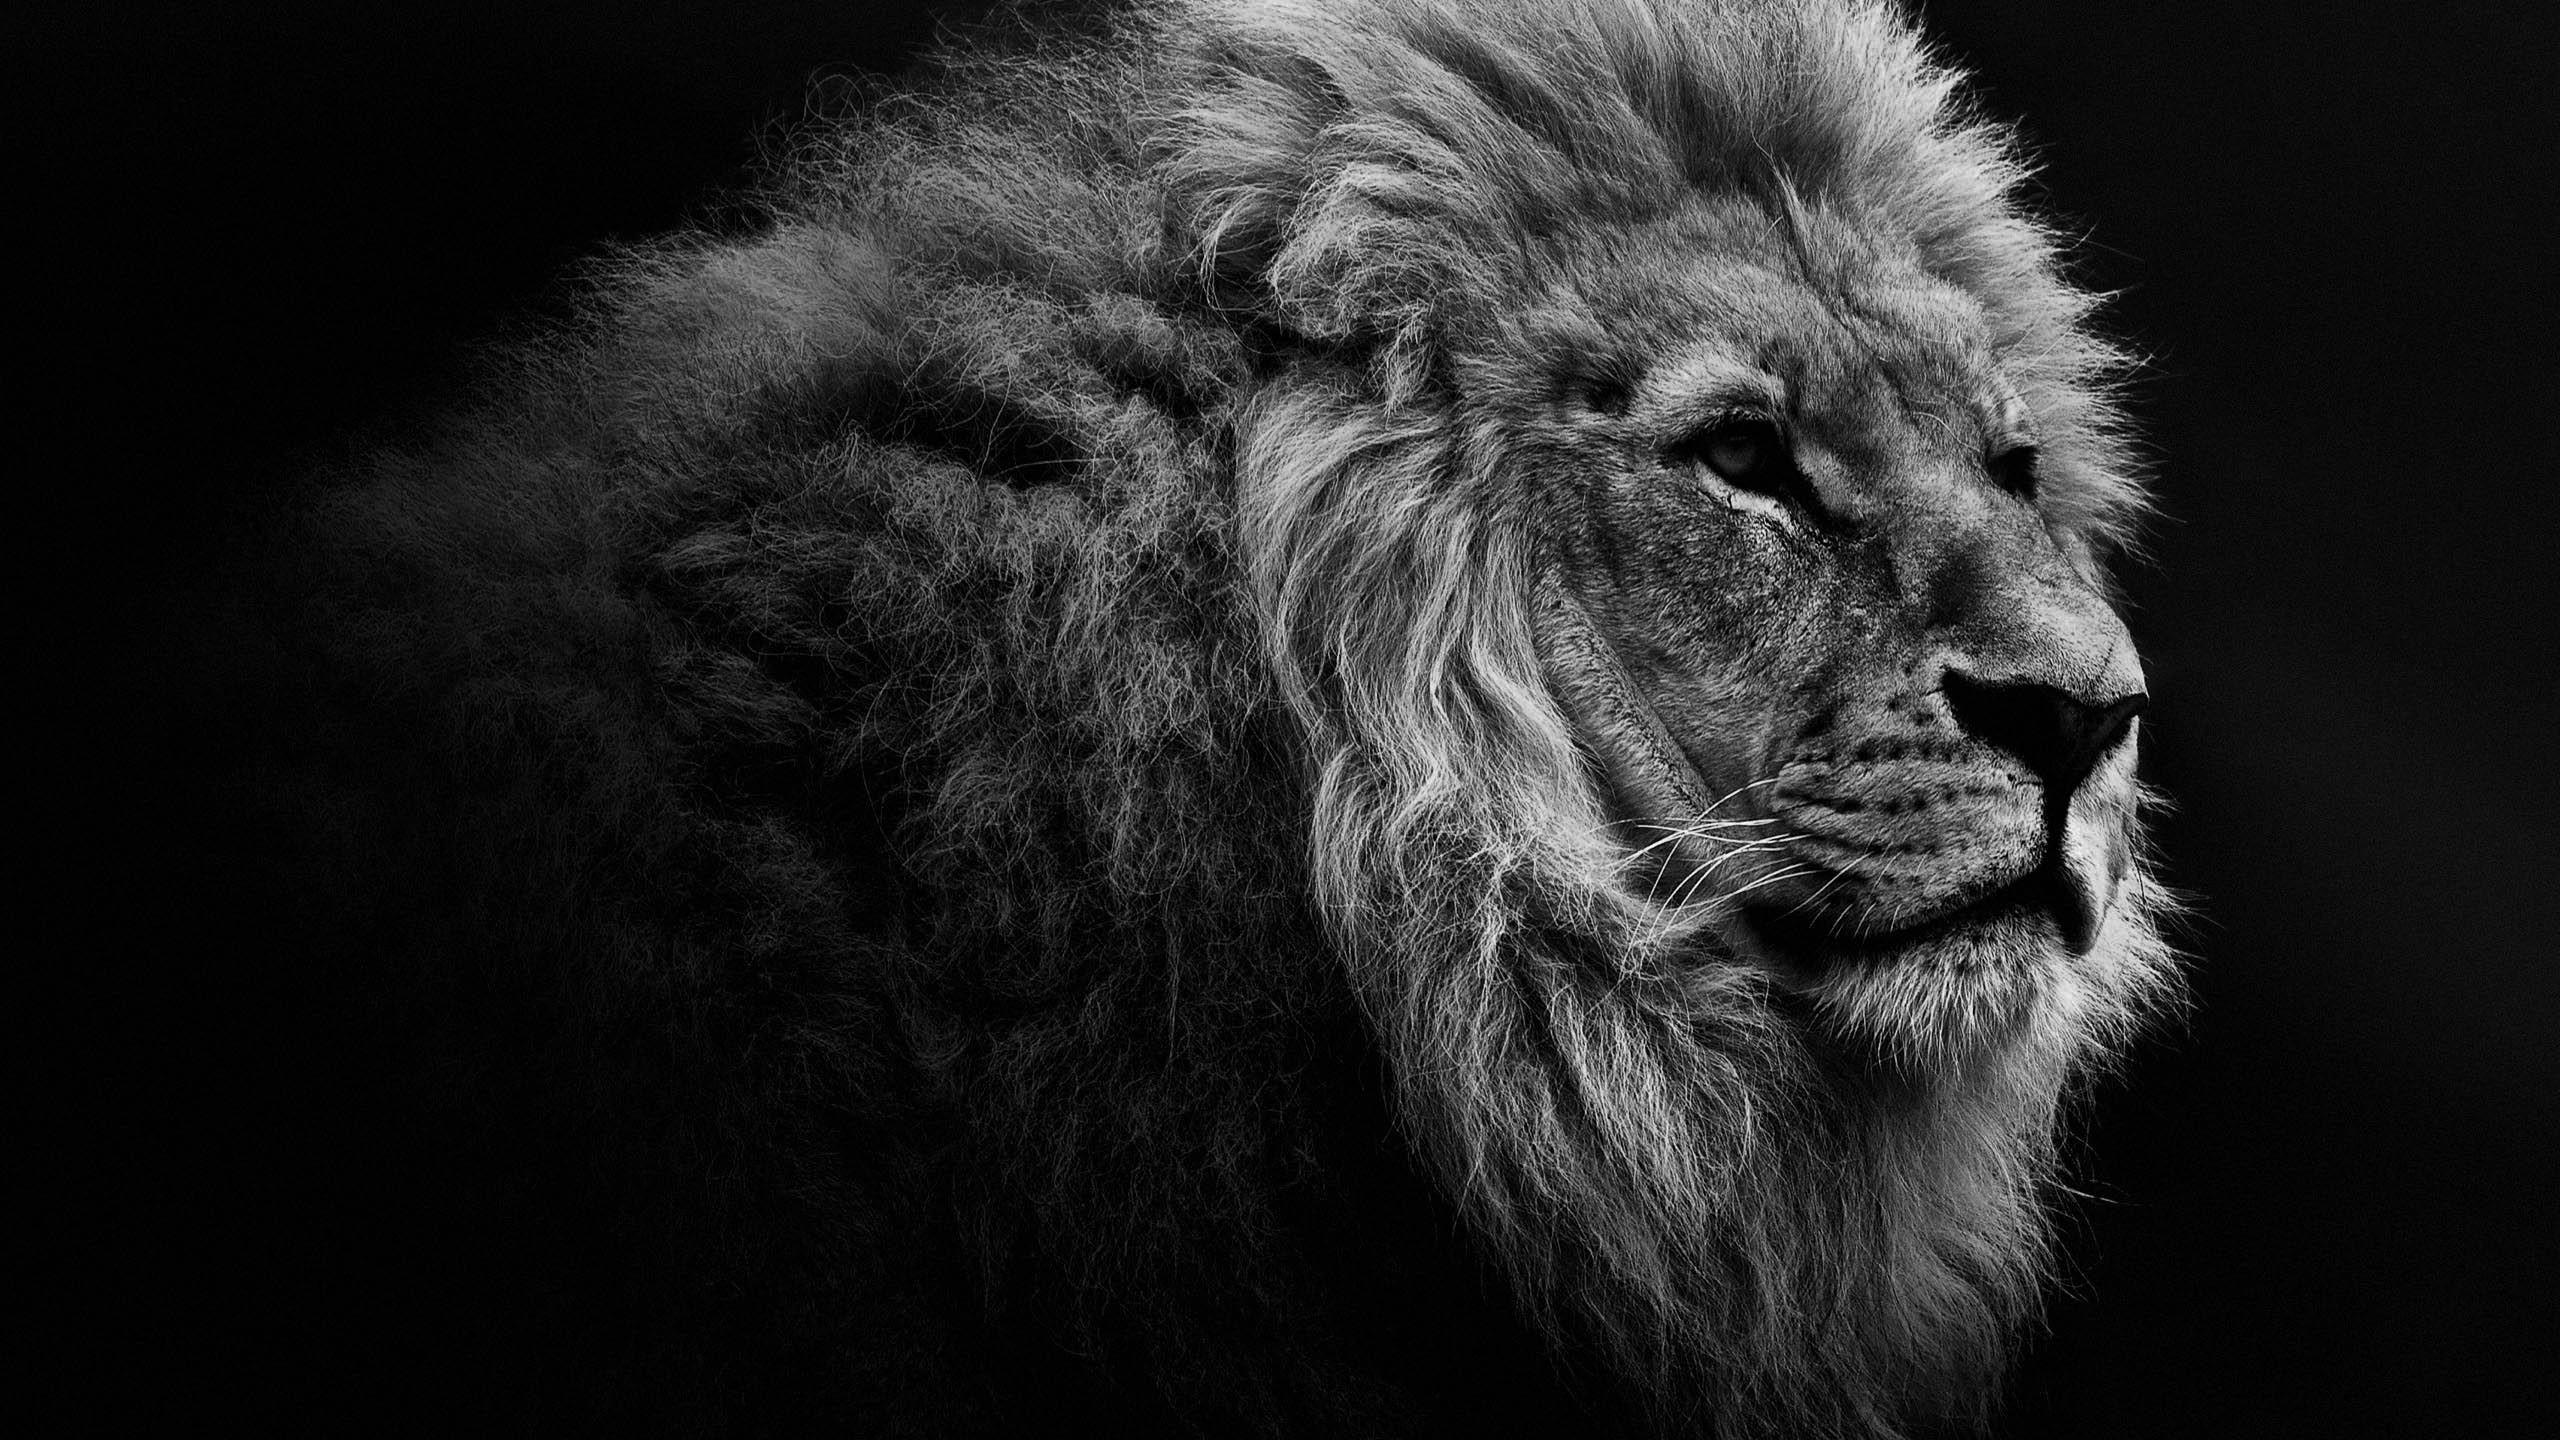 Lion Desktop Backgrounds 75 Images